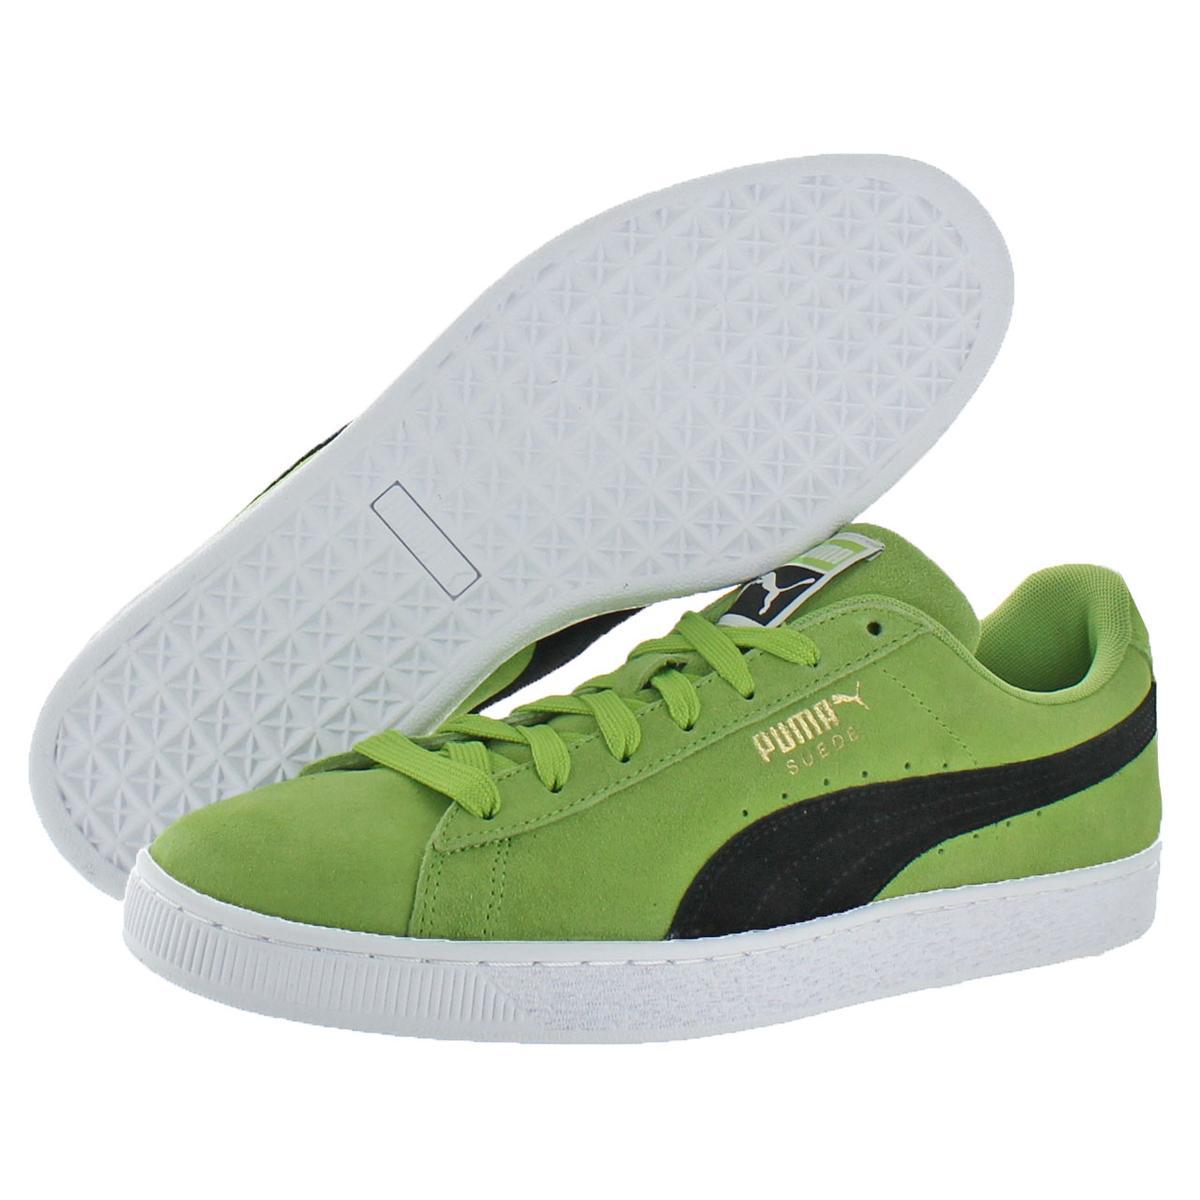 Puma-Suede-Classic-Men-039-s-Fashion-Sneakers-Shoes thumbnail 4